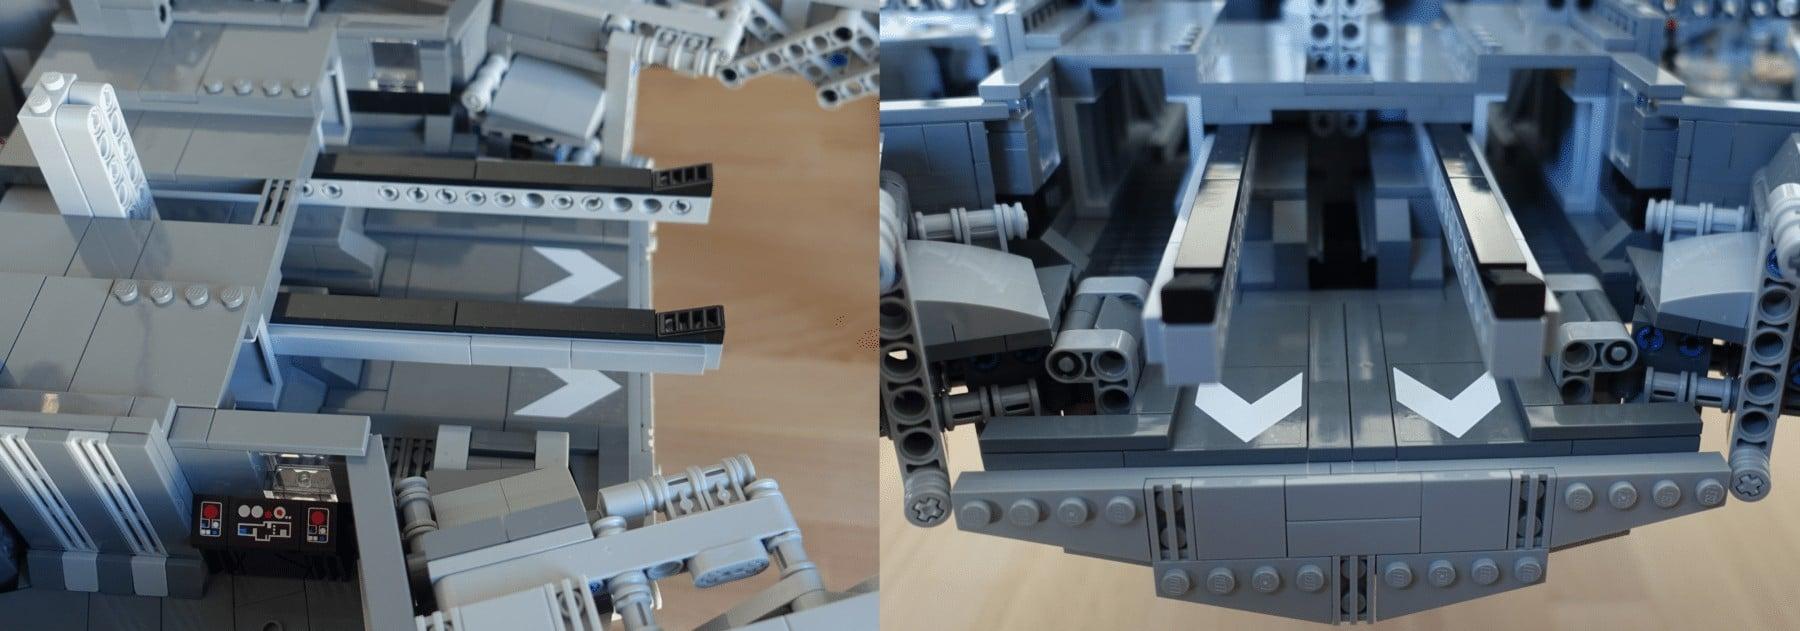 Hangar des LEGO MOC Imperial Star Destroyers